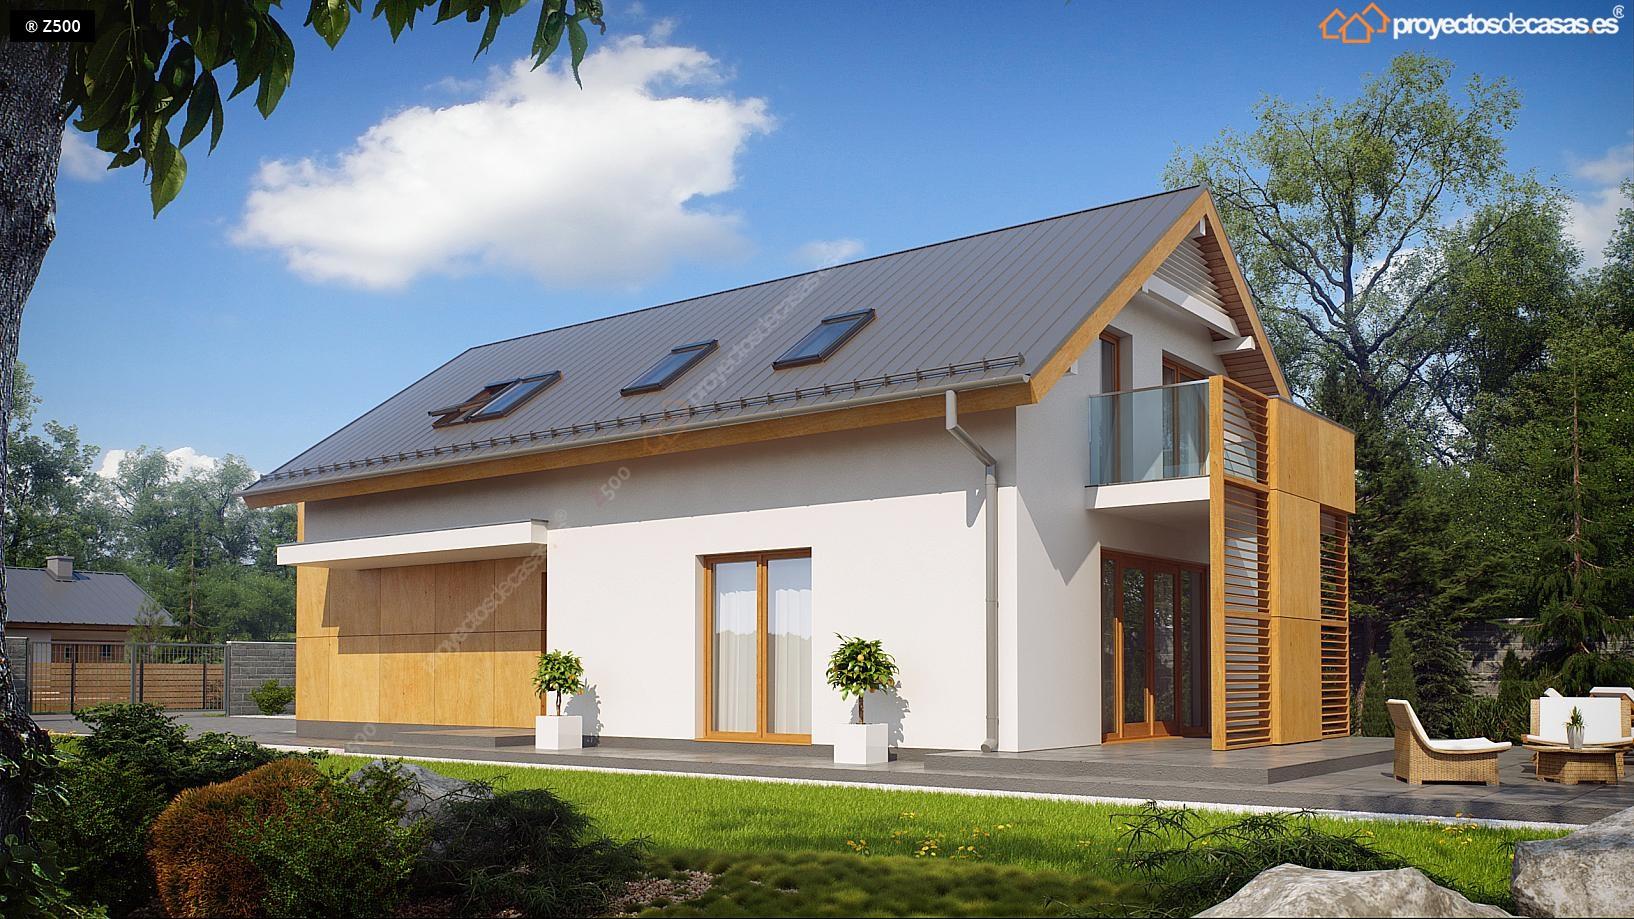 Proyectos de casas casa tradicional cubierta a dos aguas for Casa moderna a dos aguas